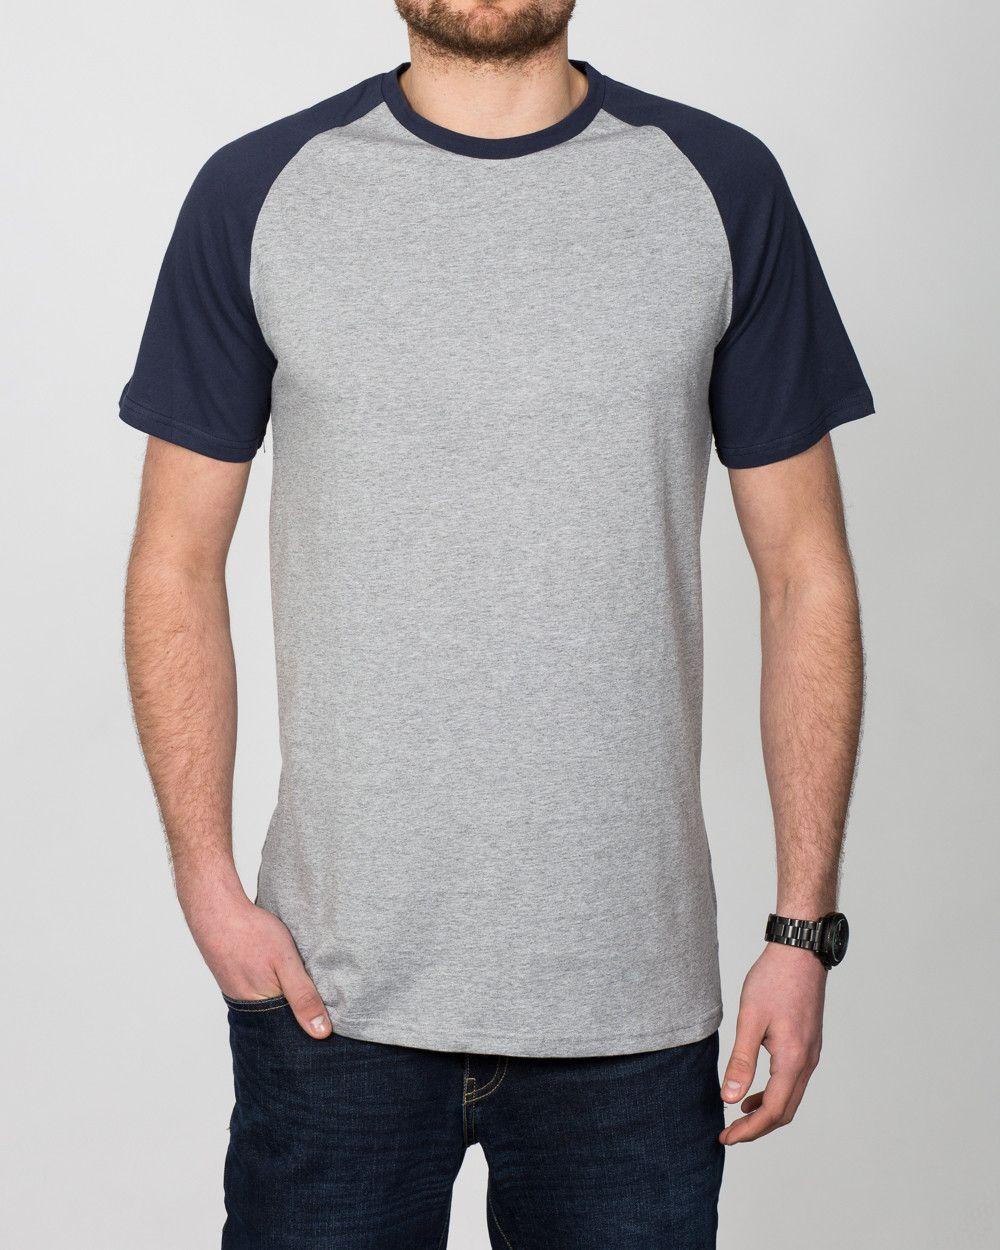 9235f87c862 2t Tall Raglan Mens Extra Long T-Shirt (grey navy)